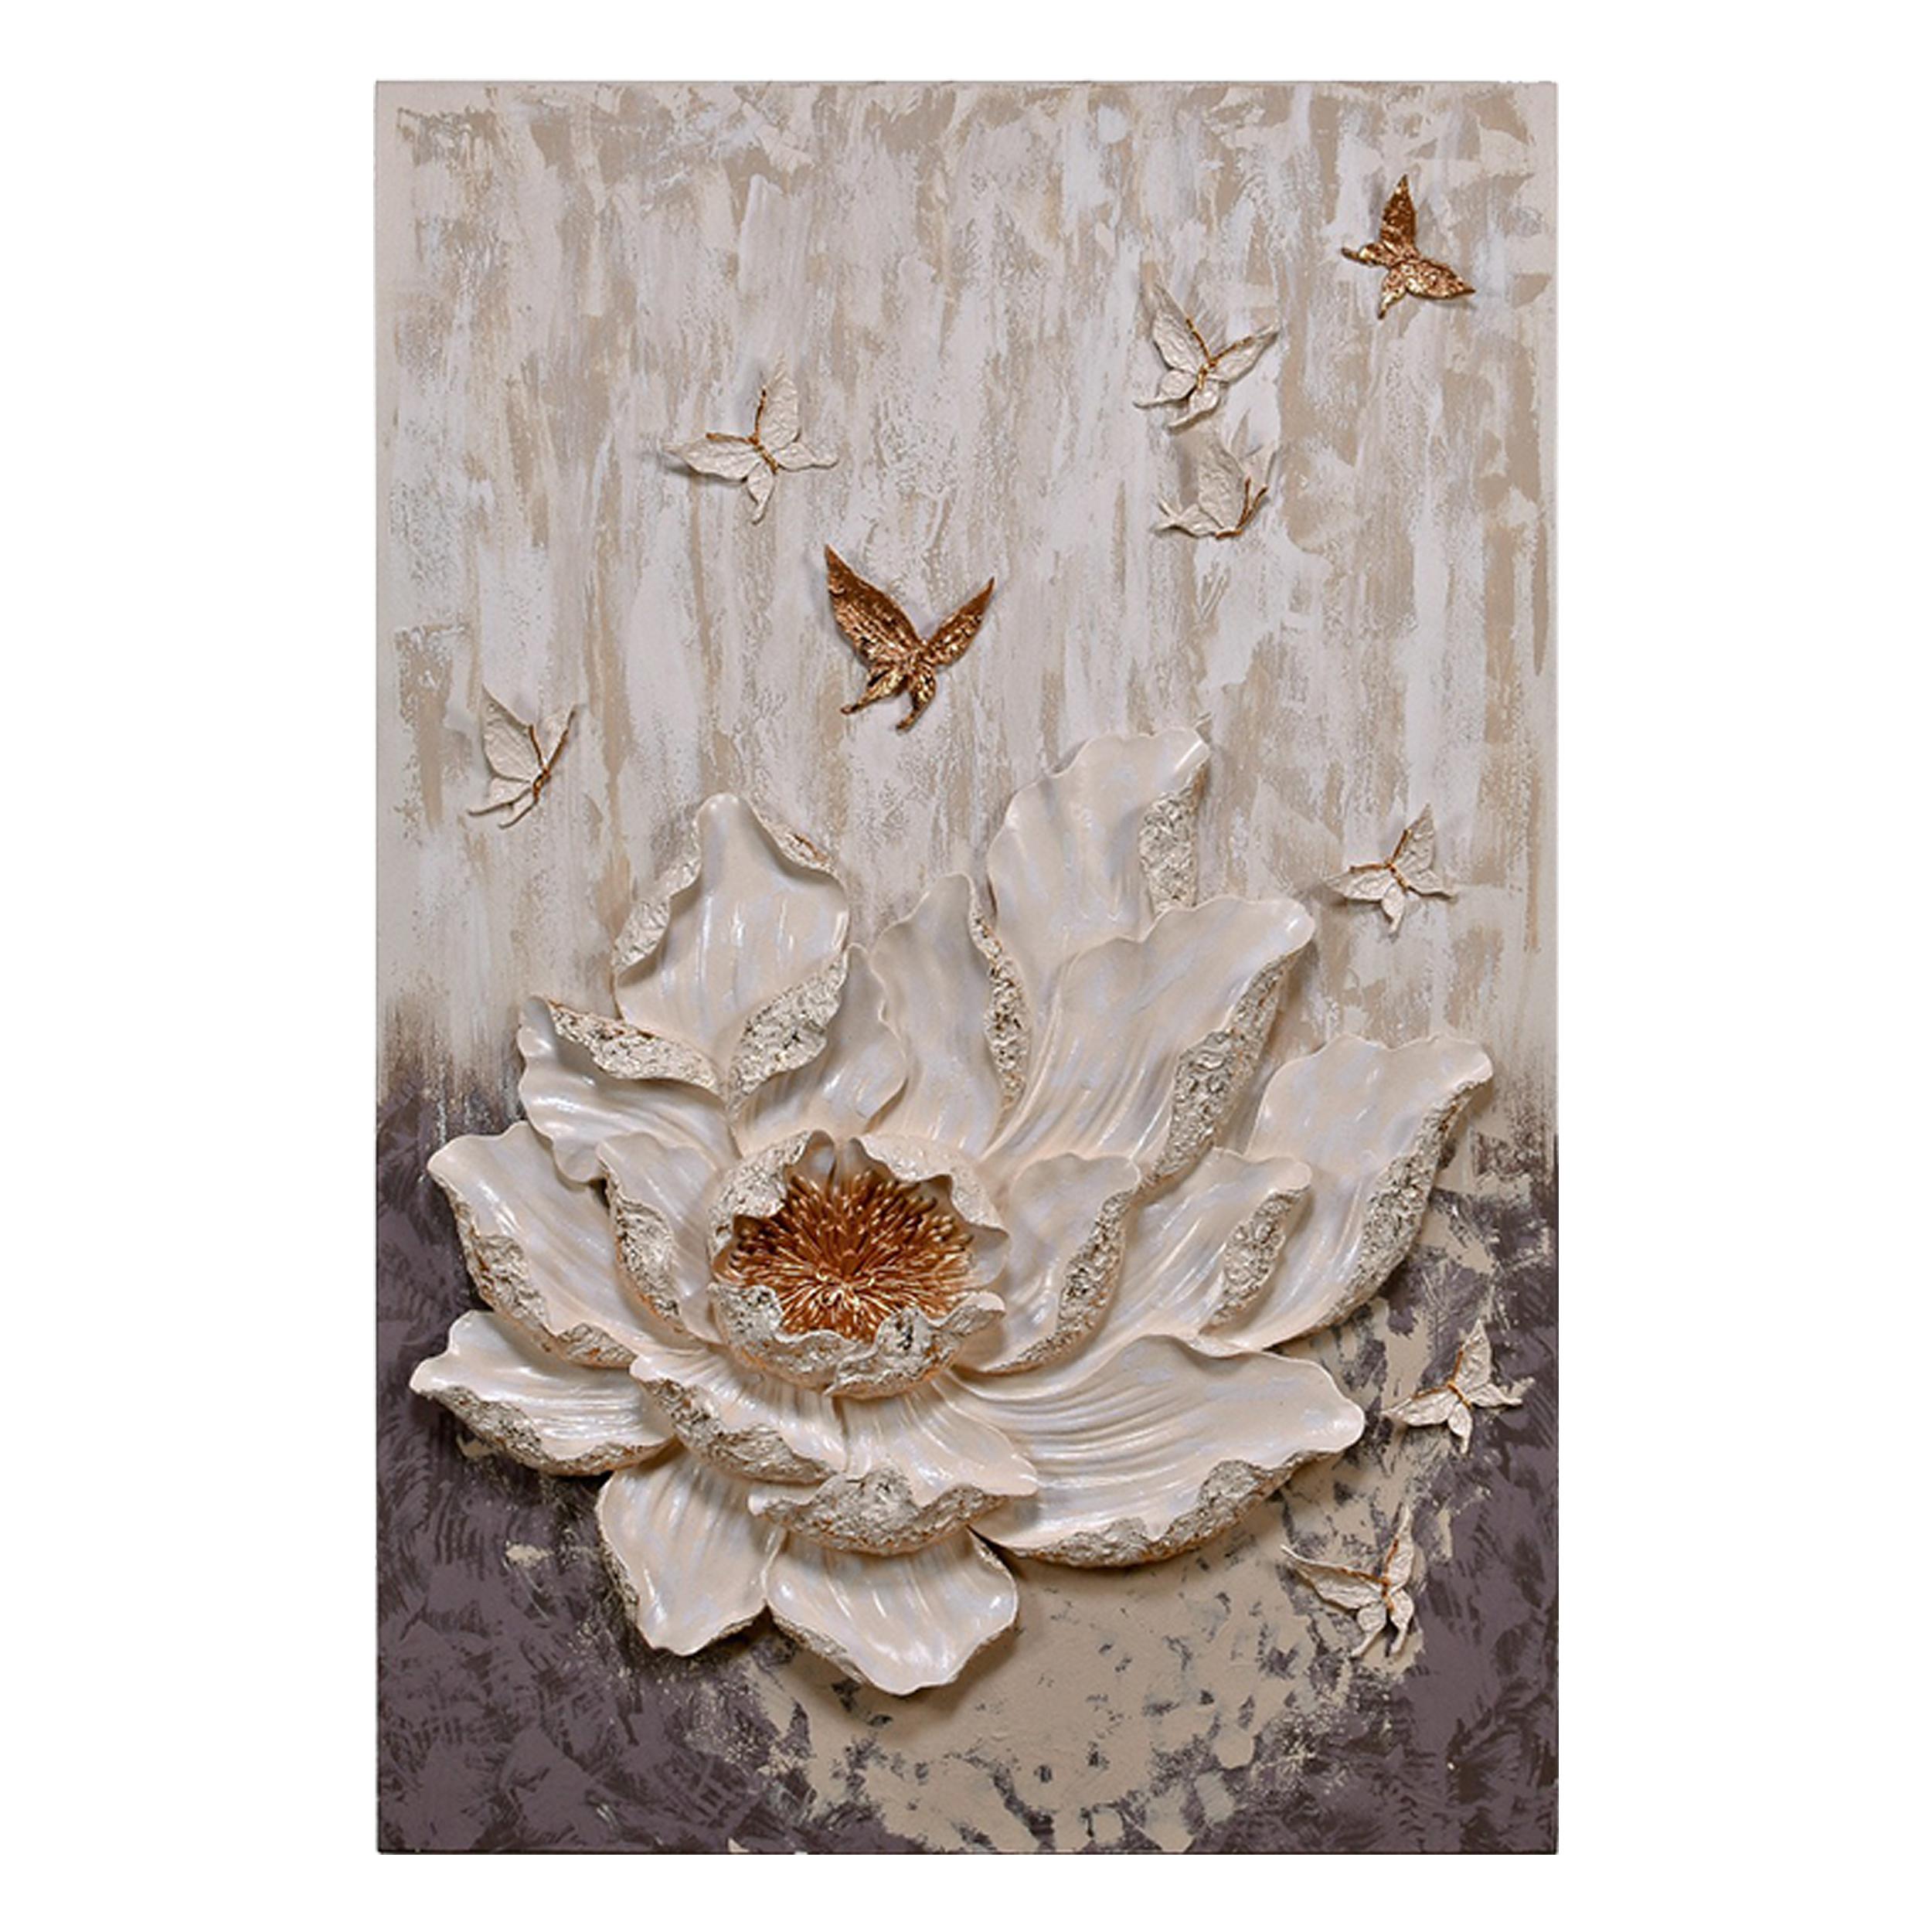 تابلو شاسی  طرح گل و پروانه  کد r0015